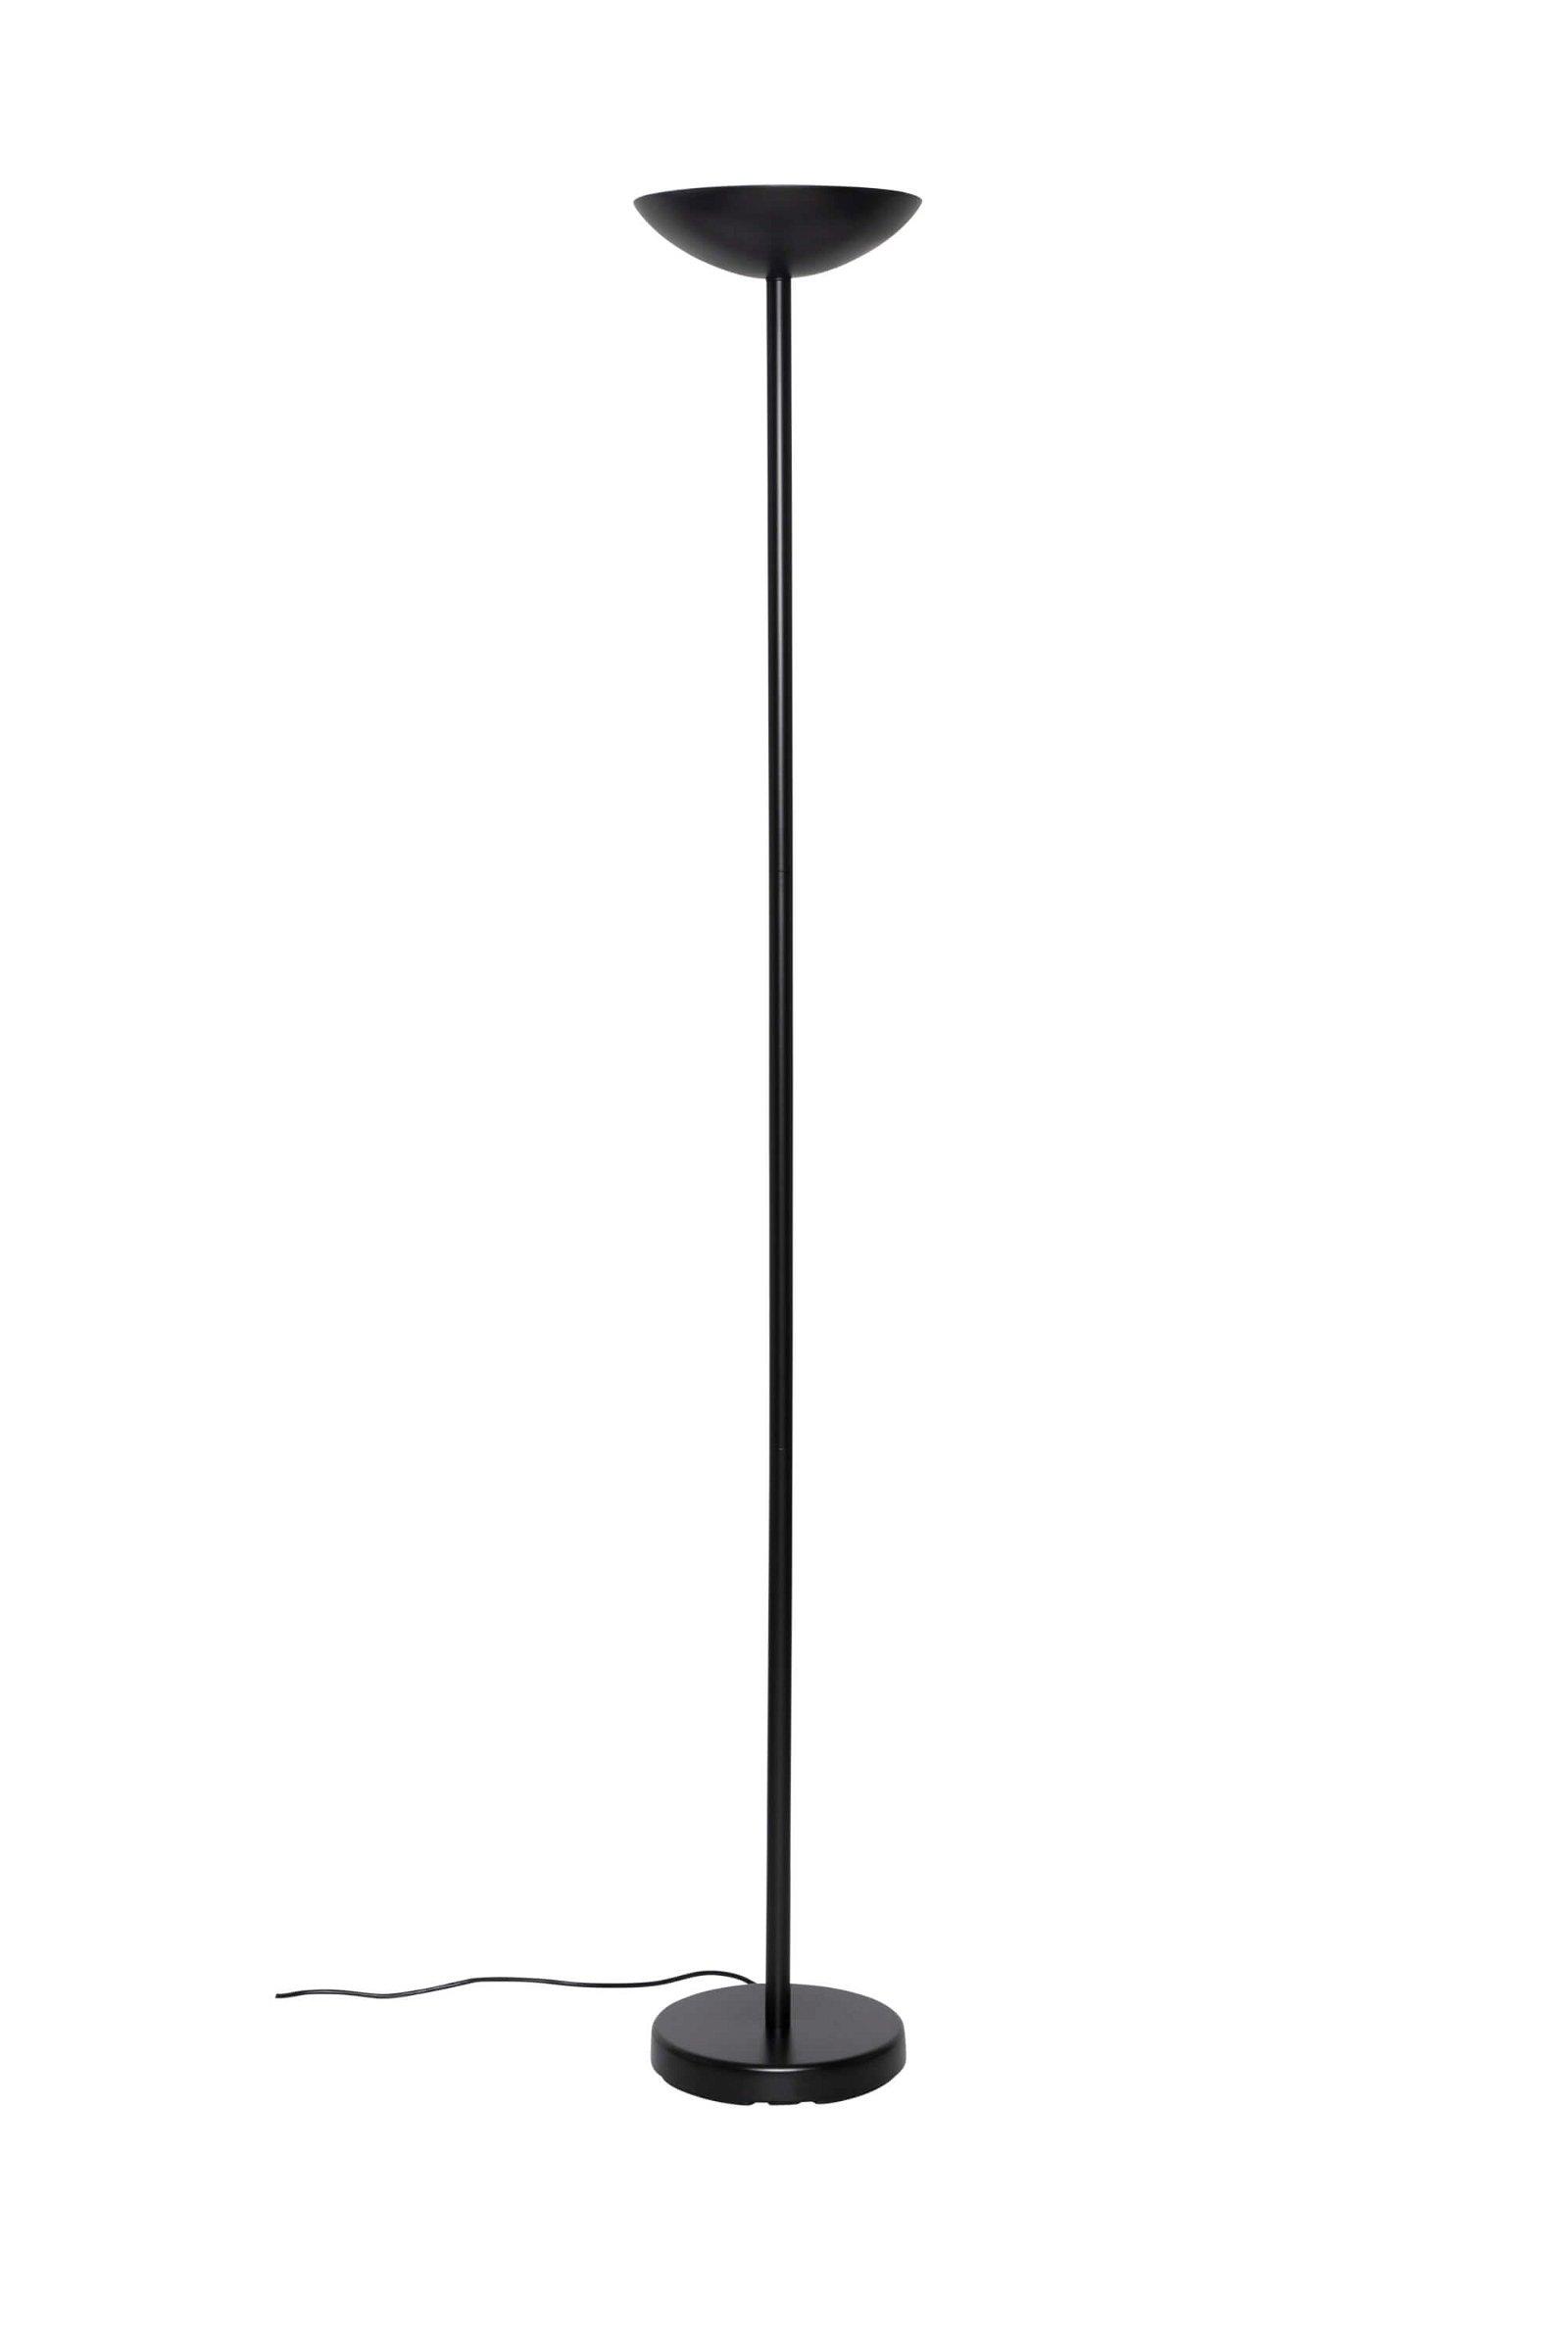 Halogen-Standleuchte MAULsky, dimmbar, schwarz